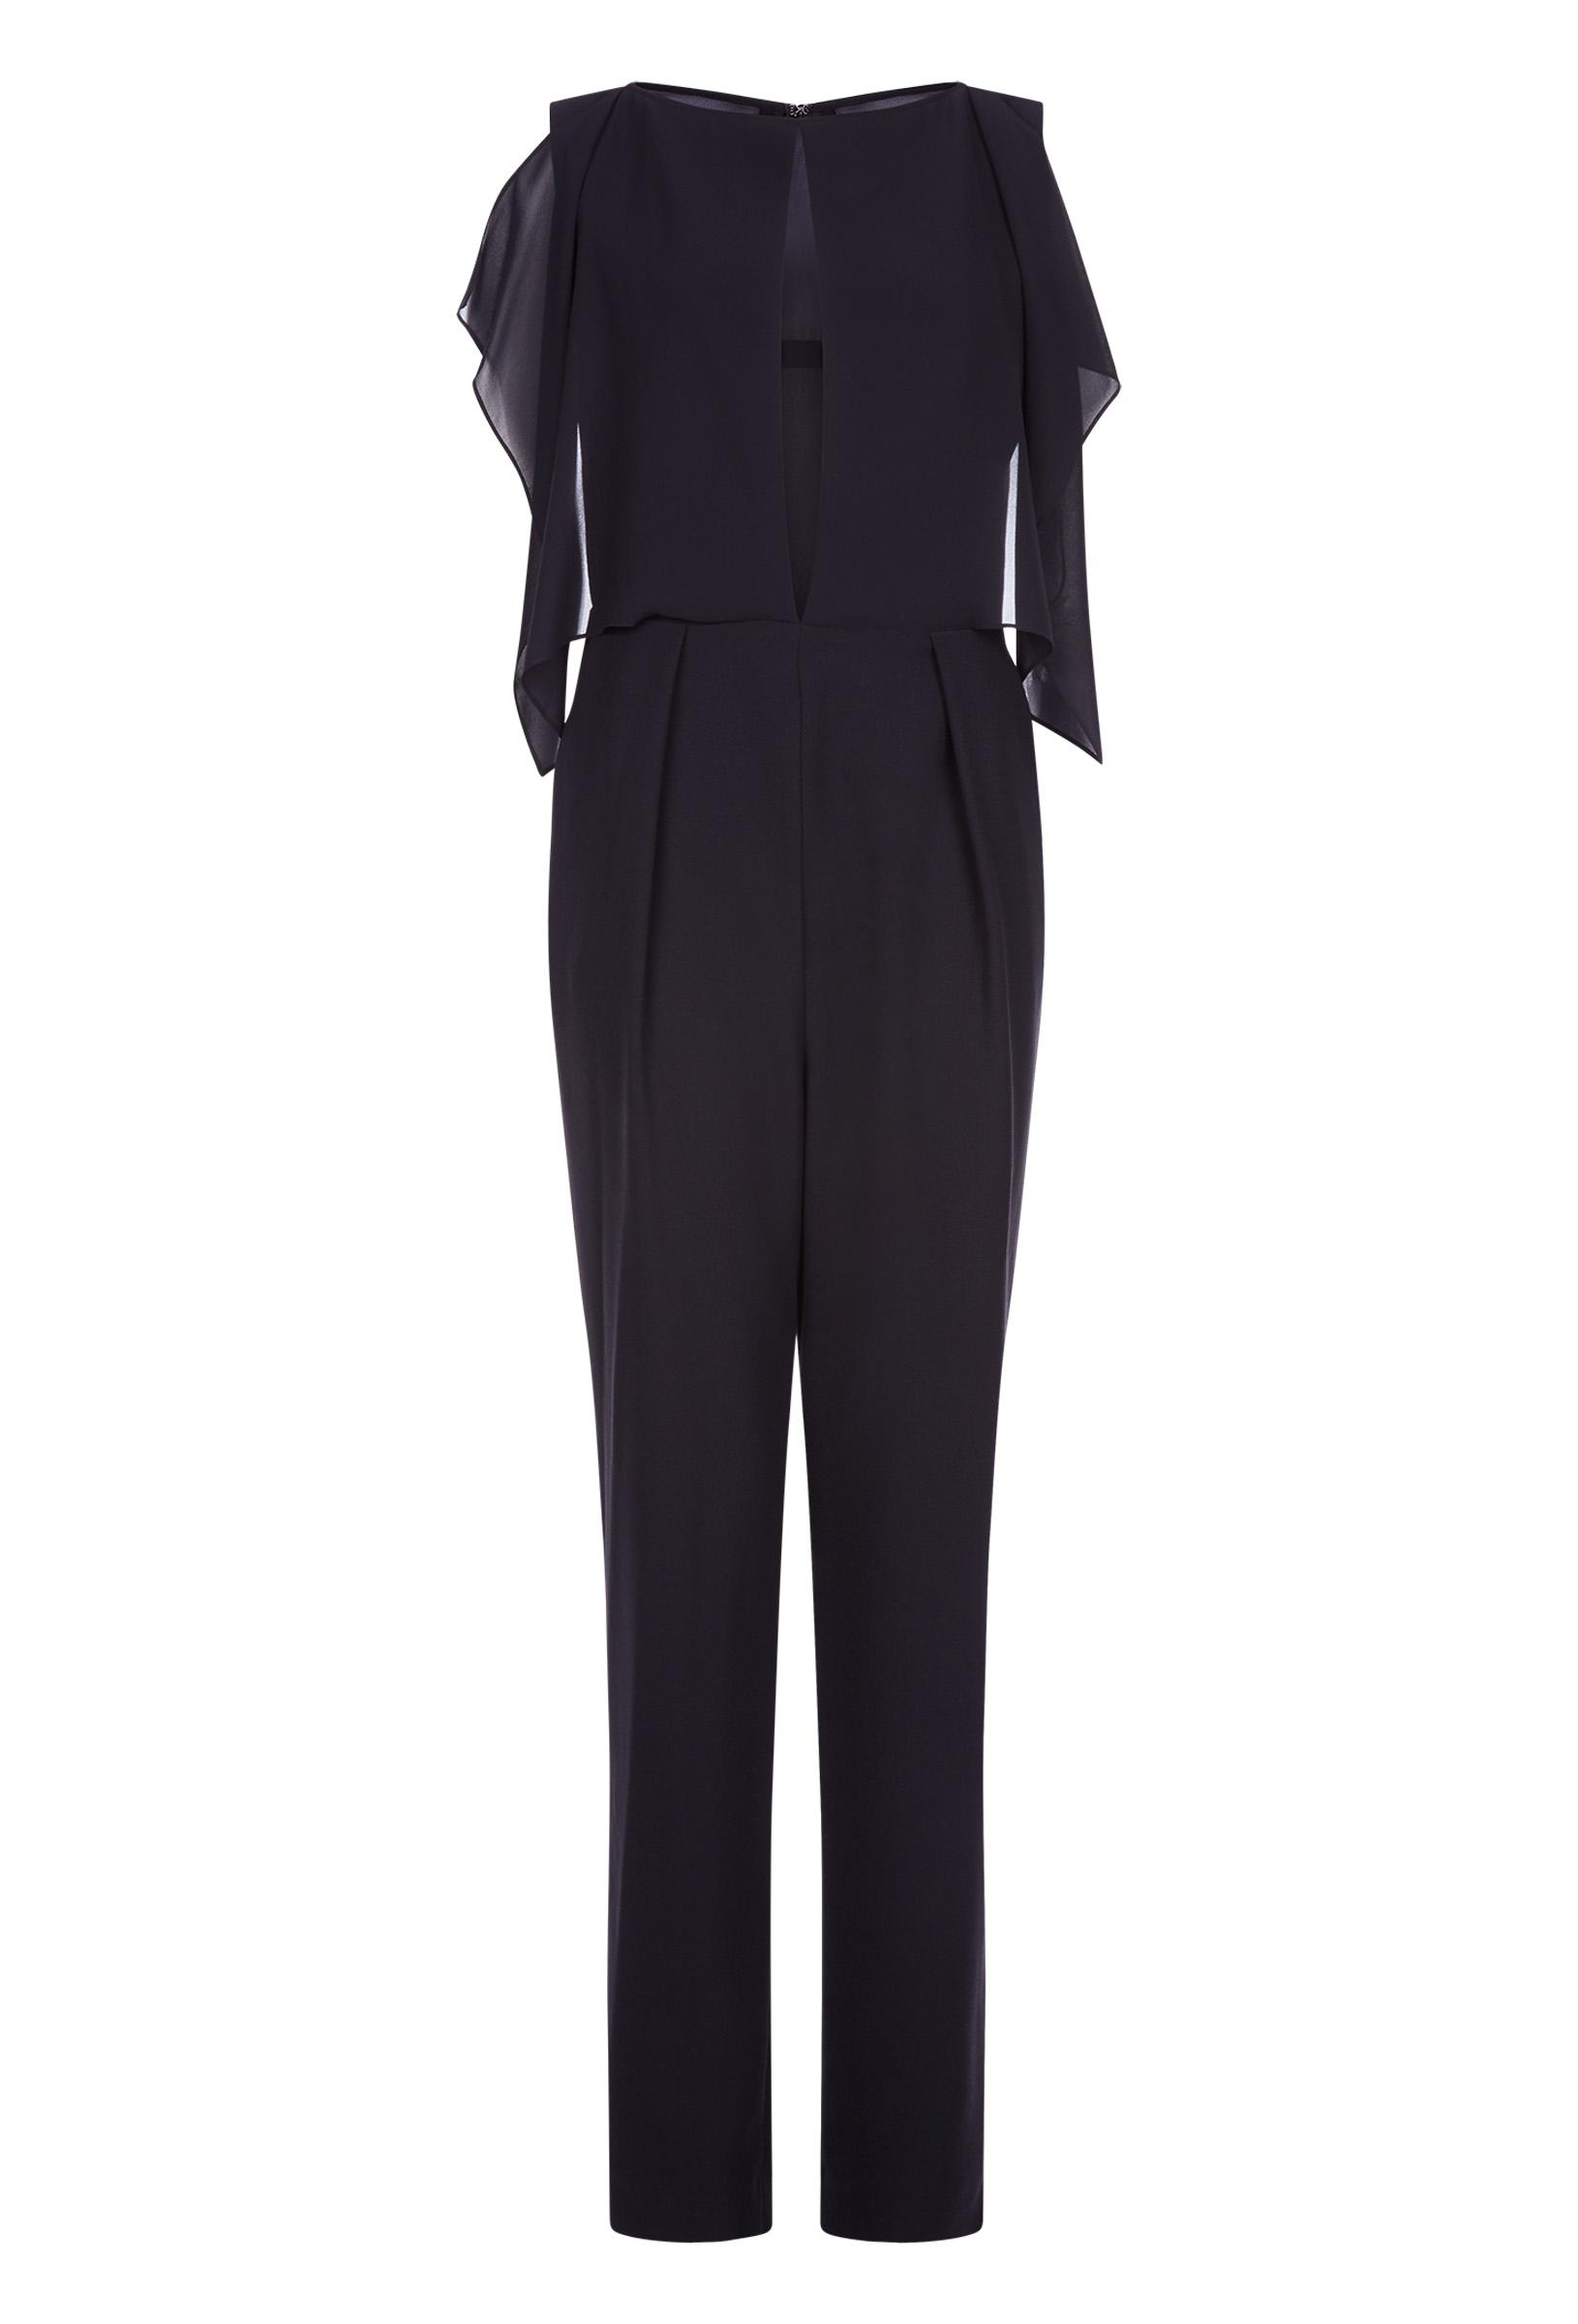 374328b2c1f Gallery. Previously sold at  AQ AQ · Women s Black Jumpsuits ...